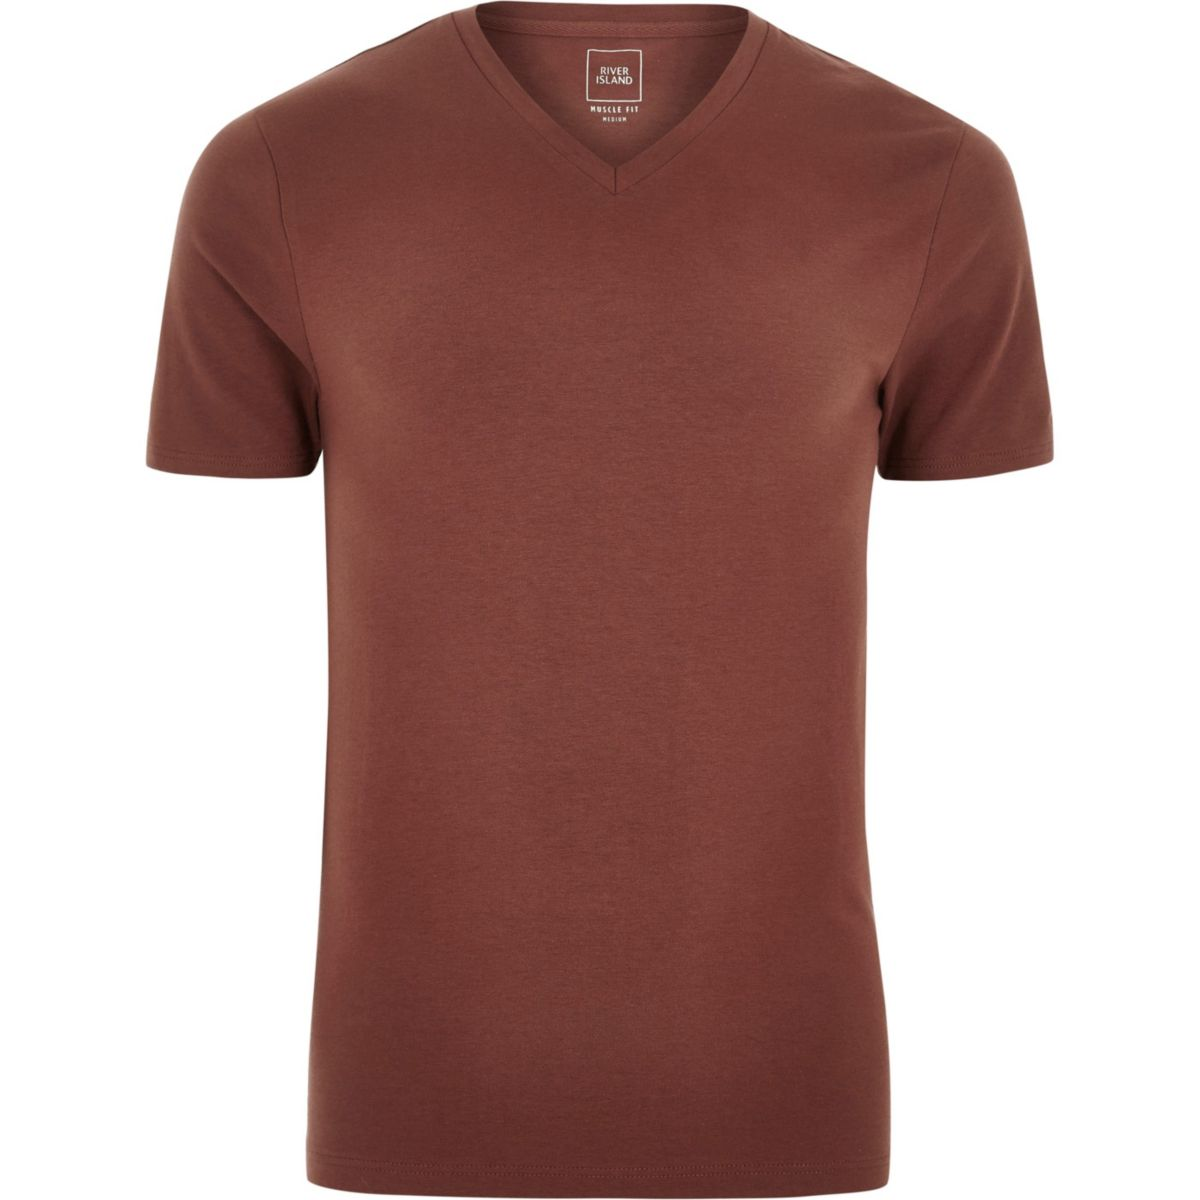 T V shirt Brown fit neck muscle wvBYxIZq